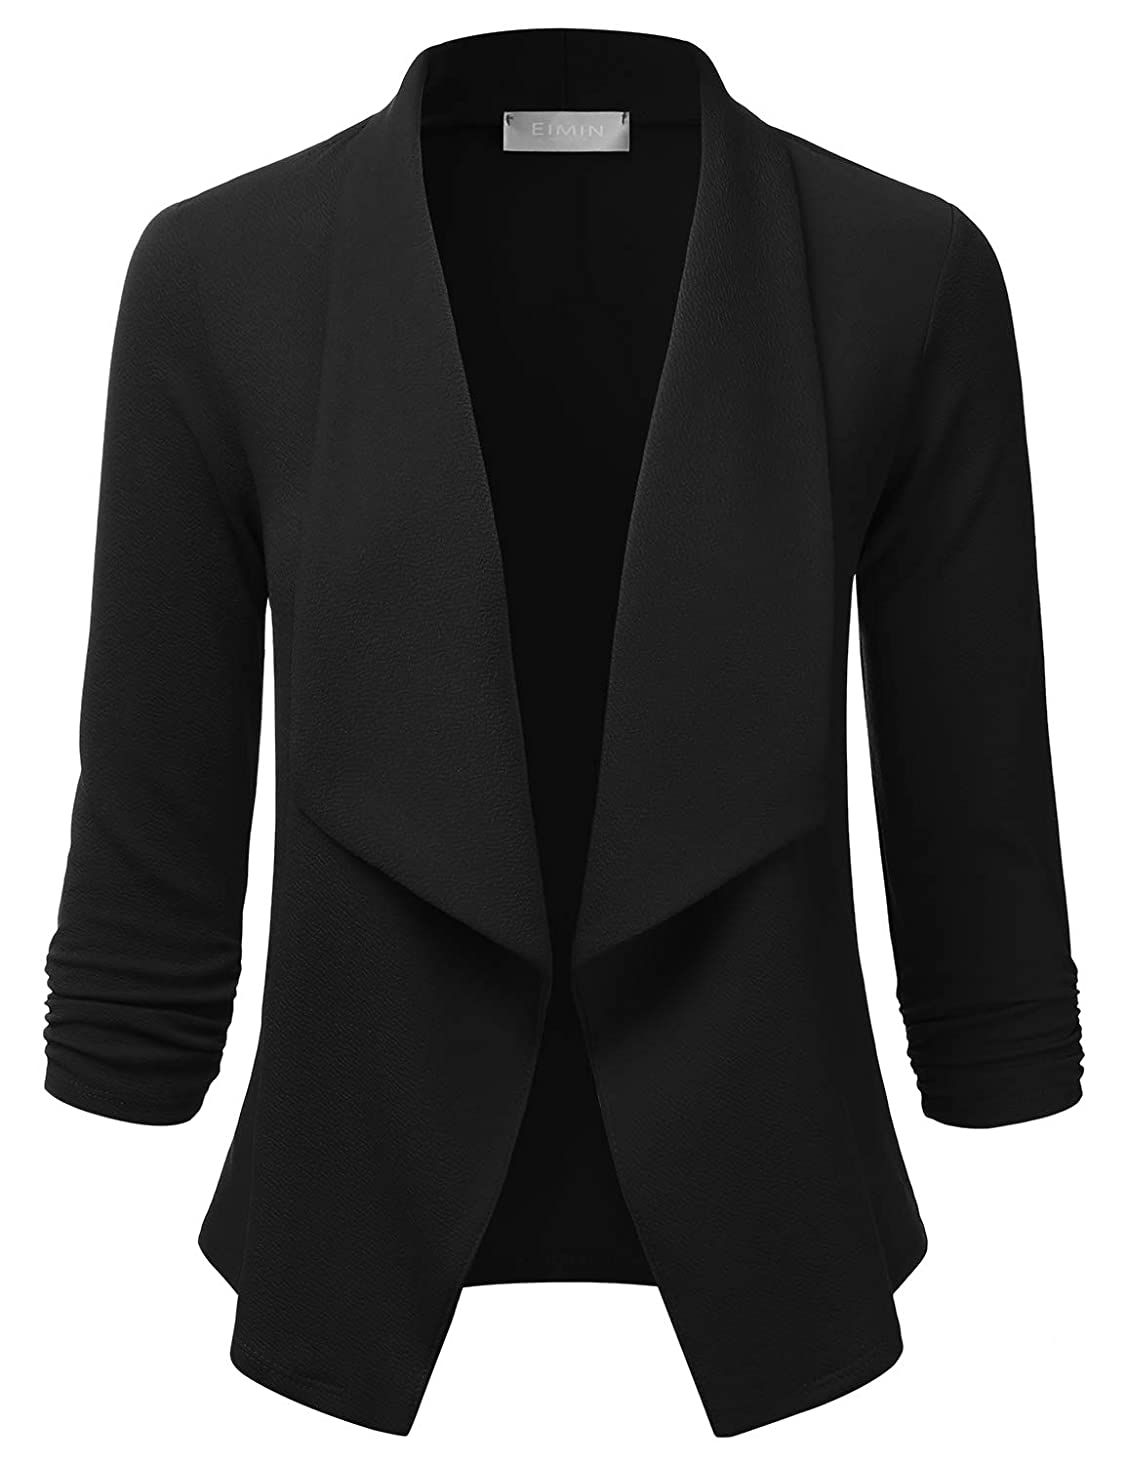 EIMIN Women's Lightweight Stretch 3/4 Sleeve Blazer Open Front Jacket (S-3XL)